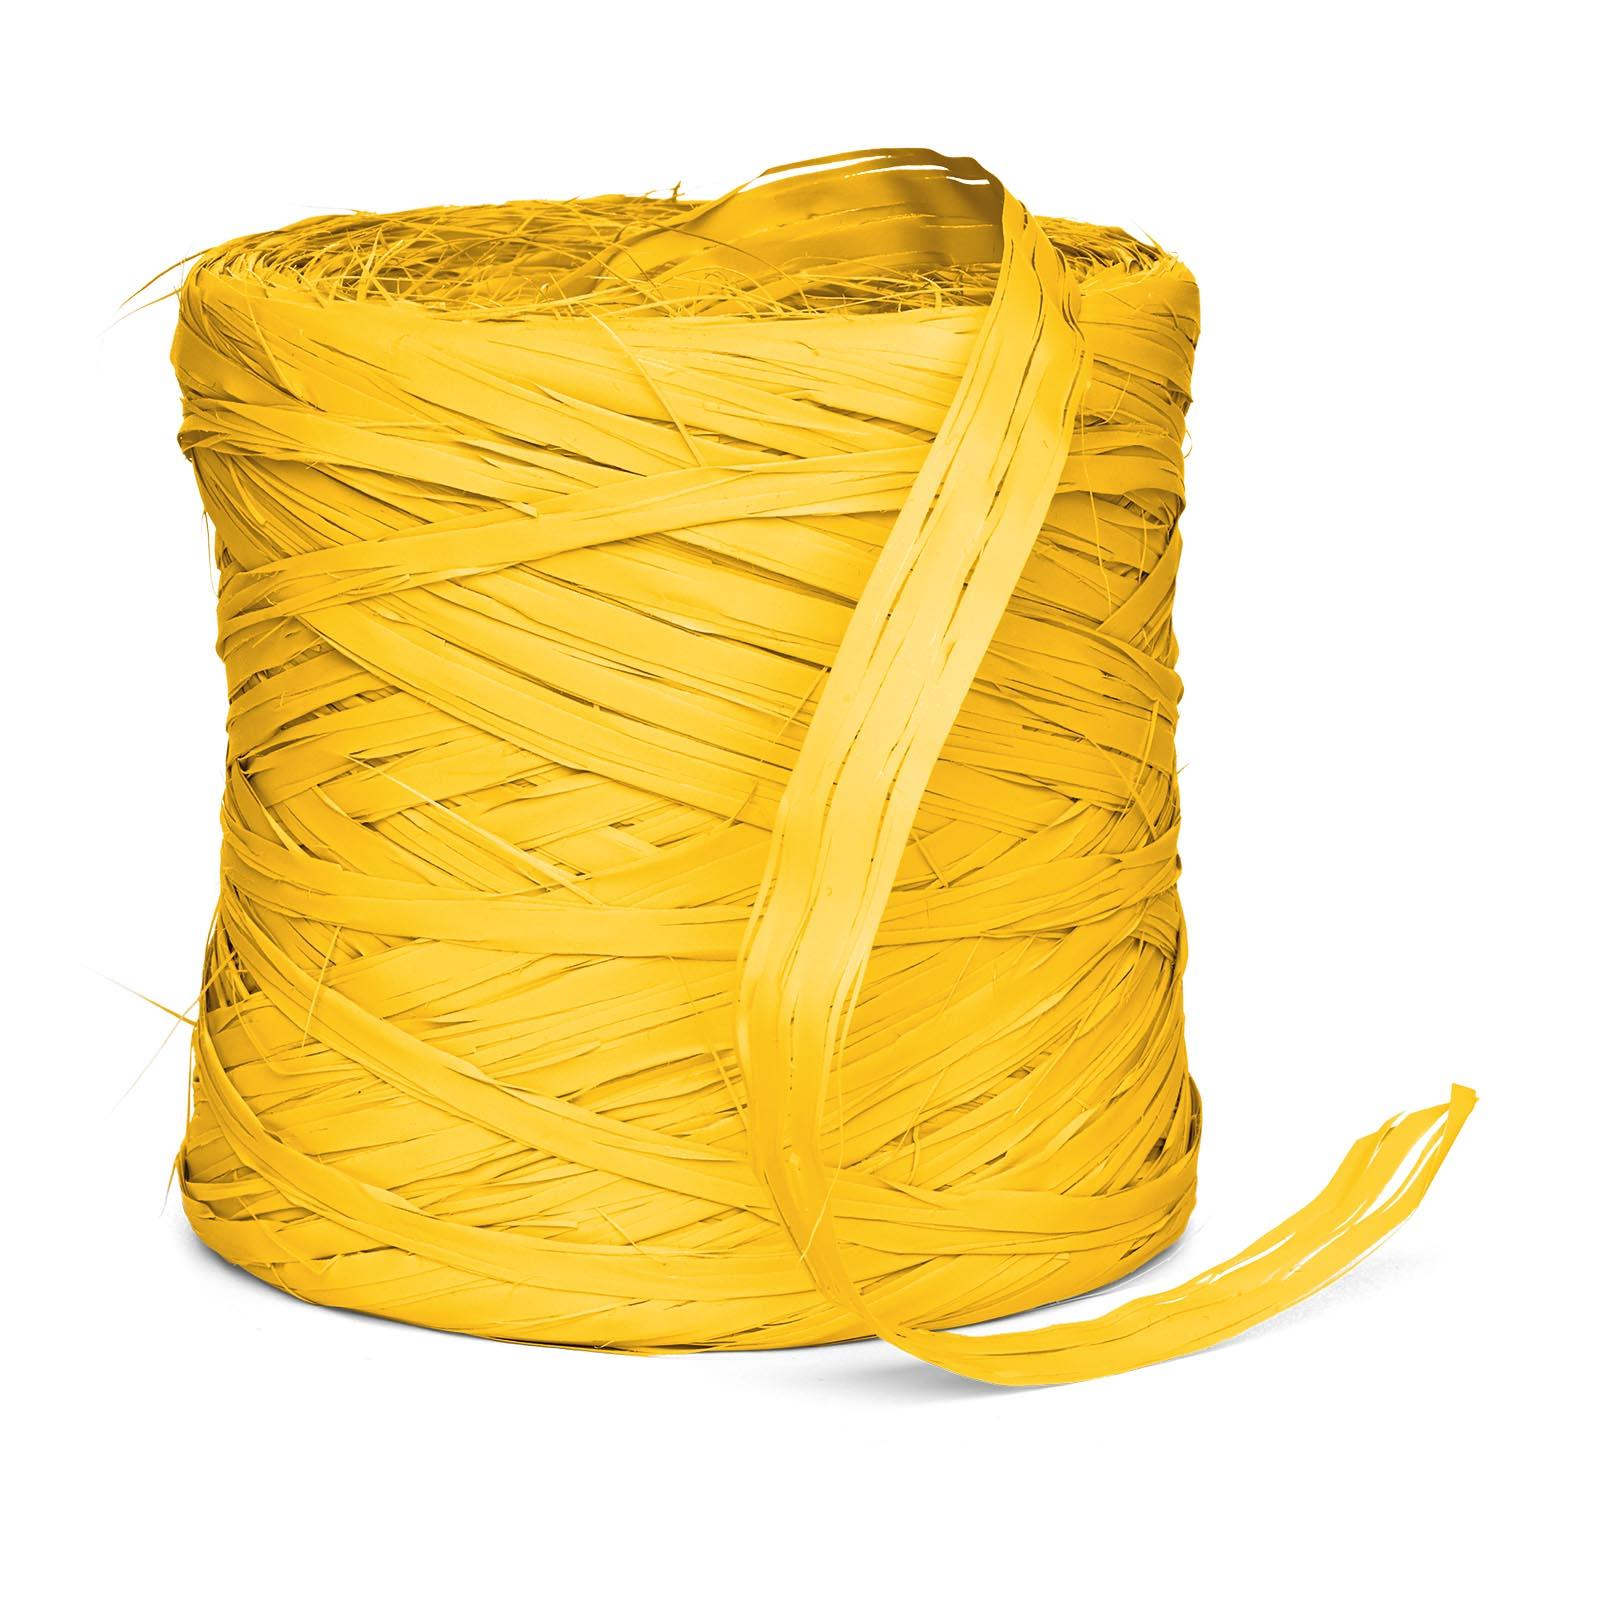 Geschenkbast raphia synthetik gelb 200m geschenkbast for Restposten dekoartikel